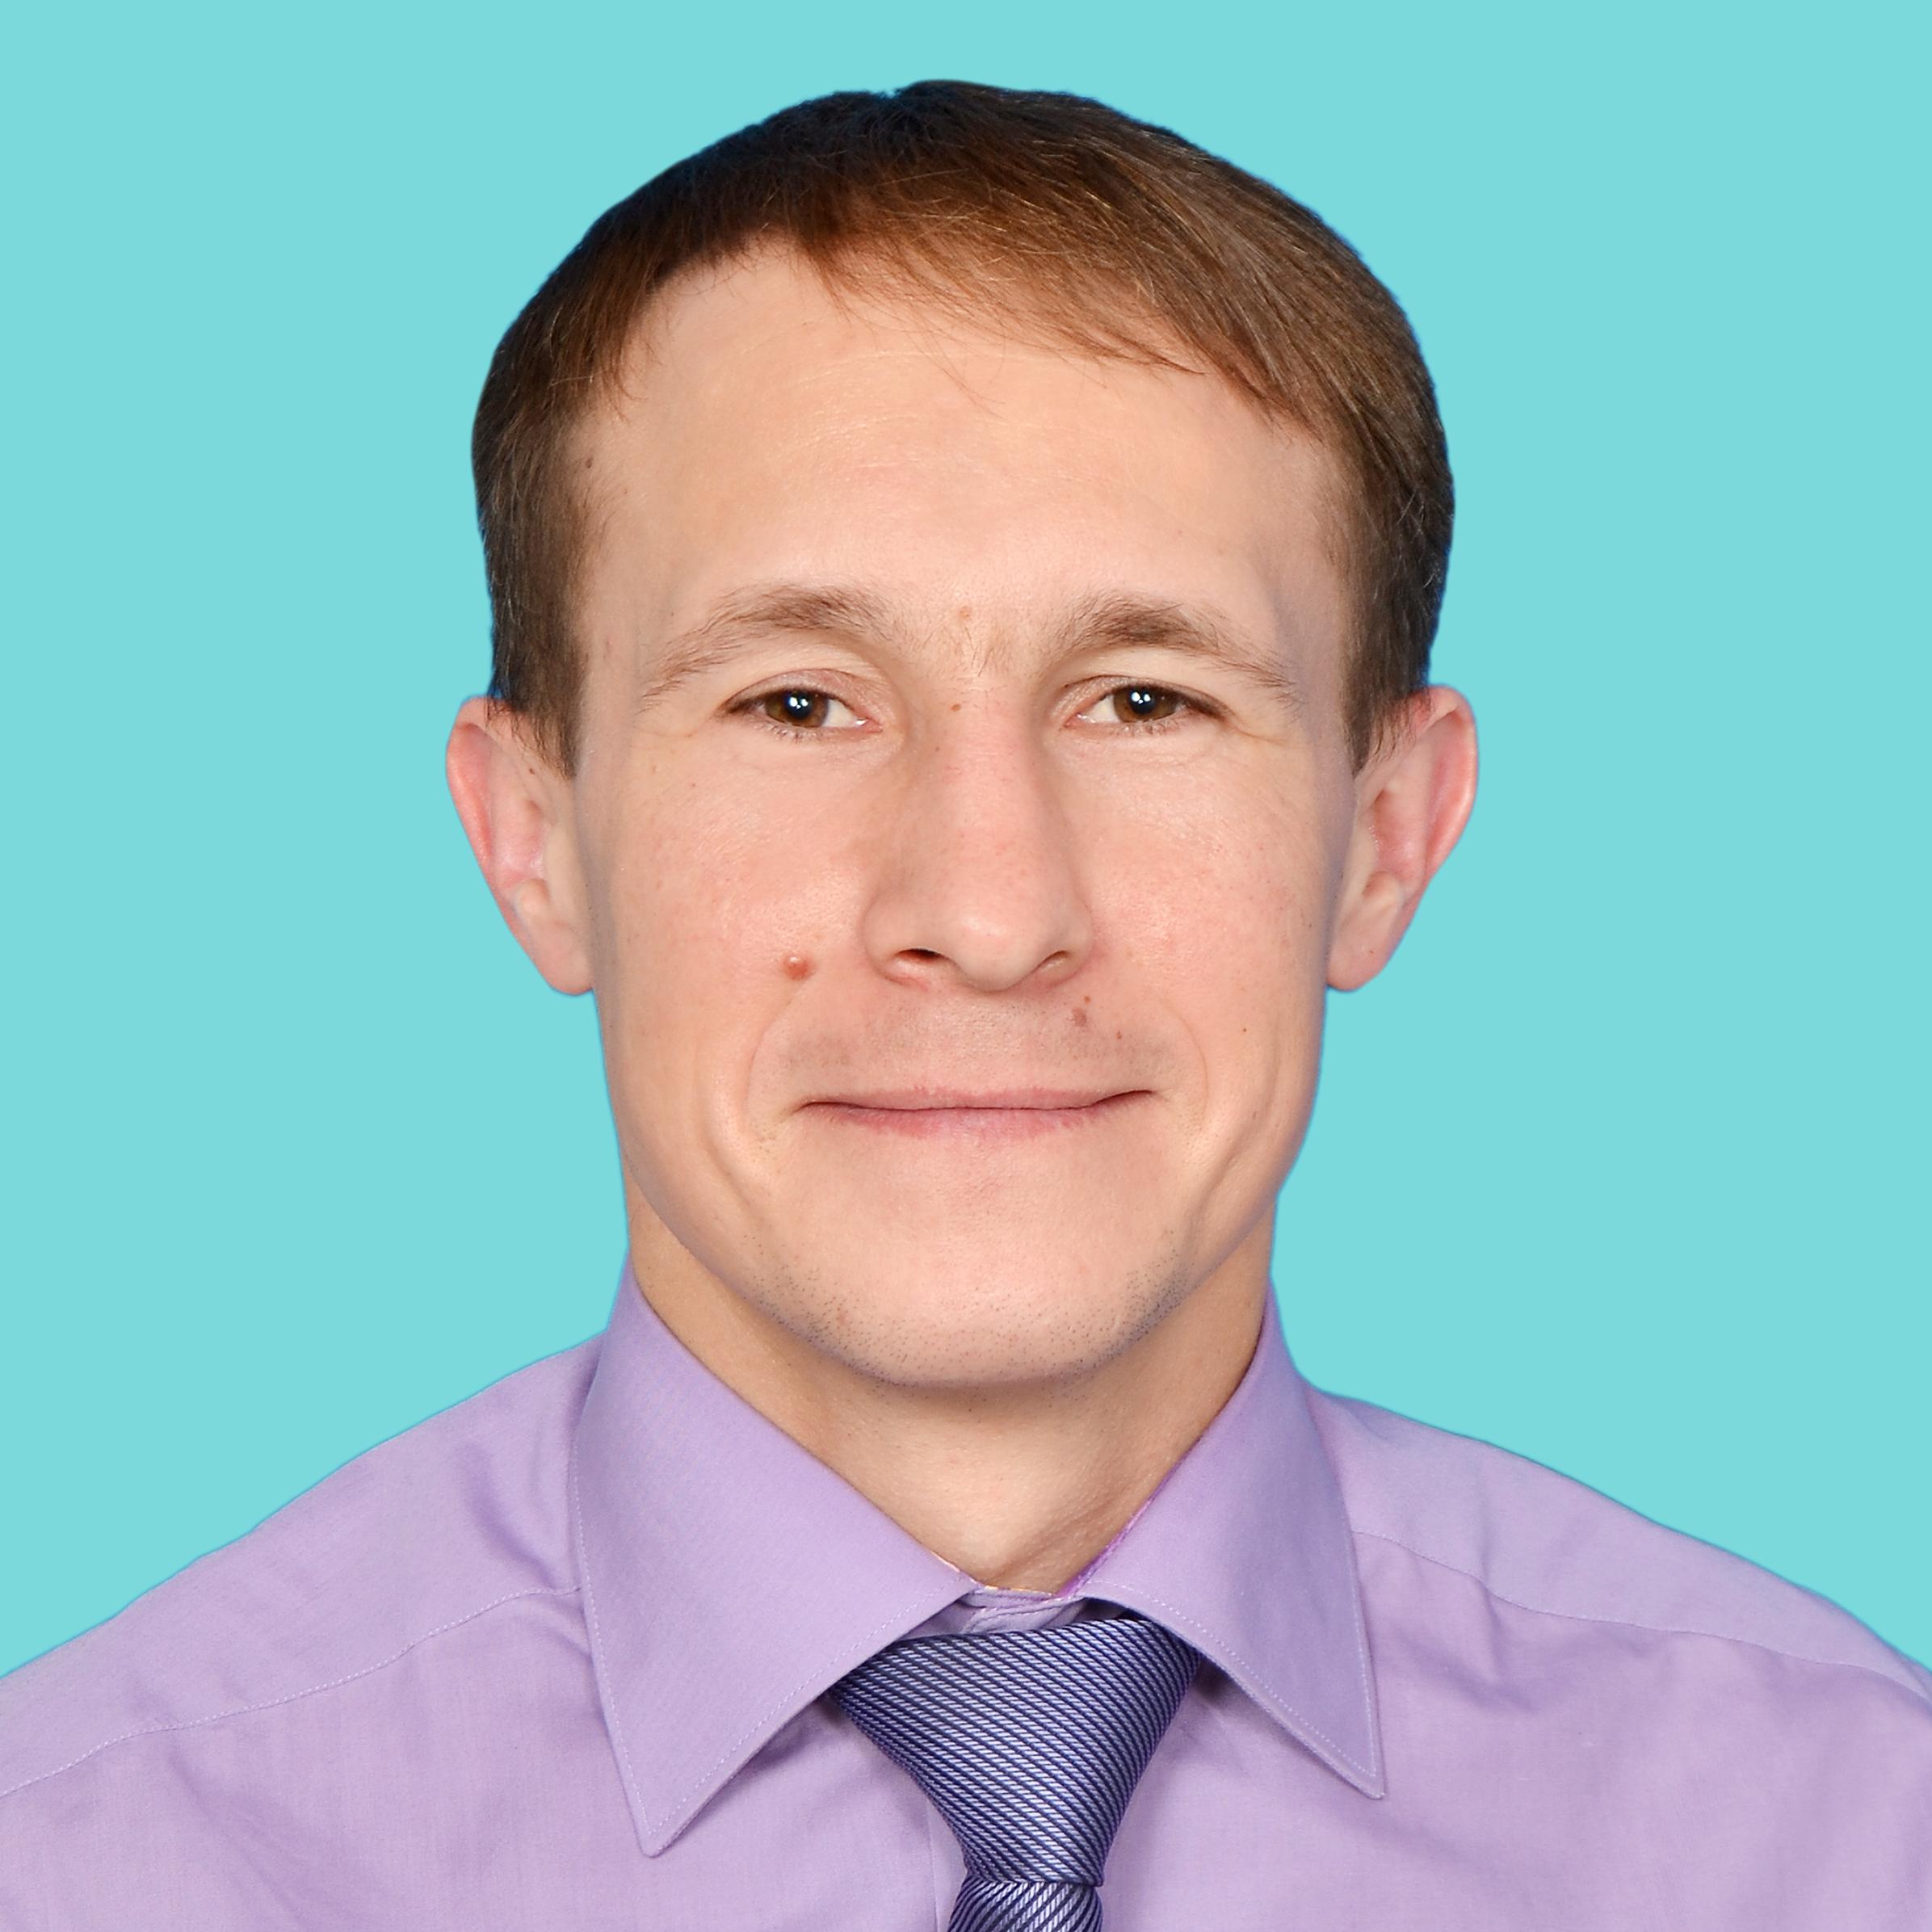 Успеньев Алексей Анатольевич